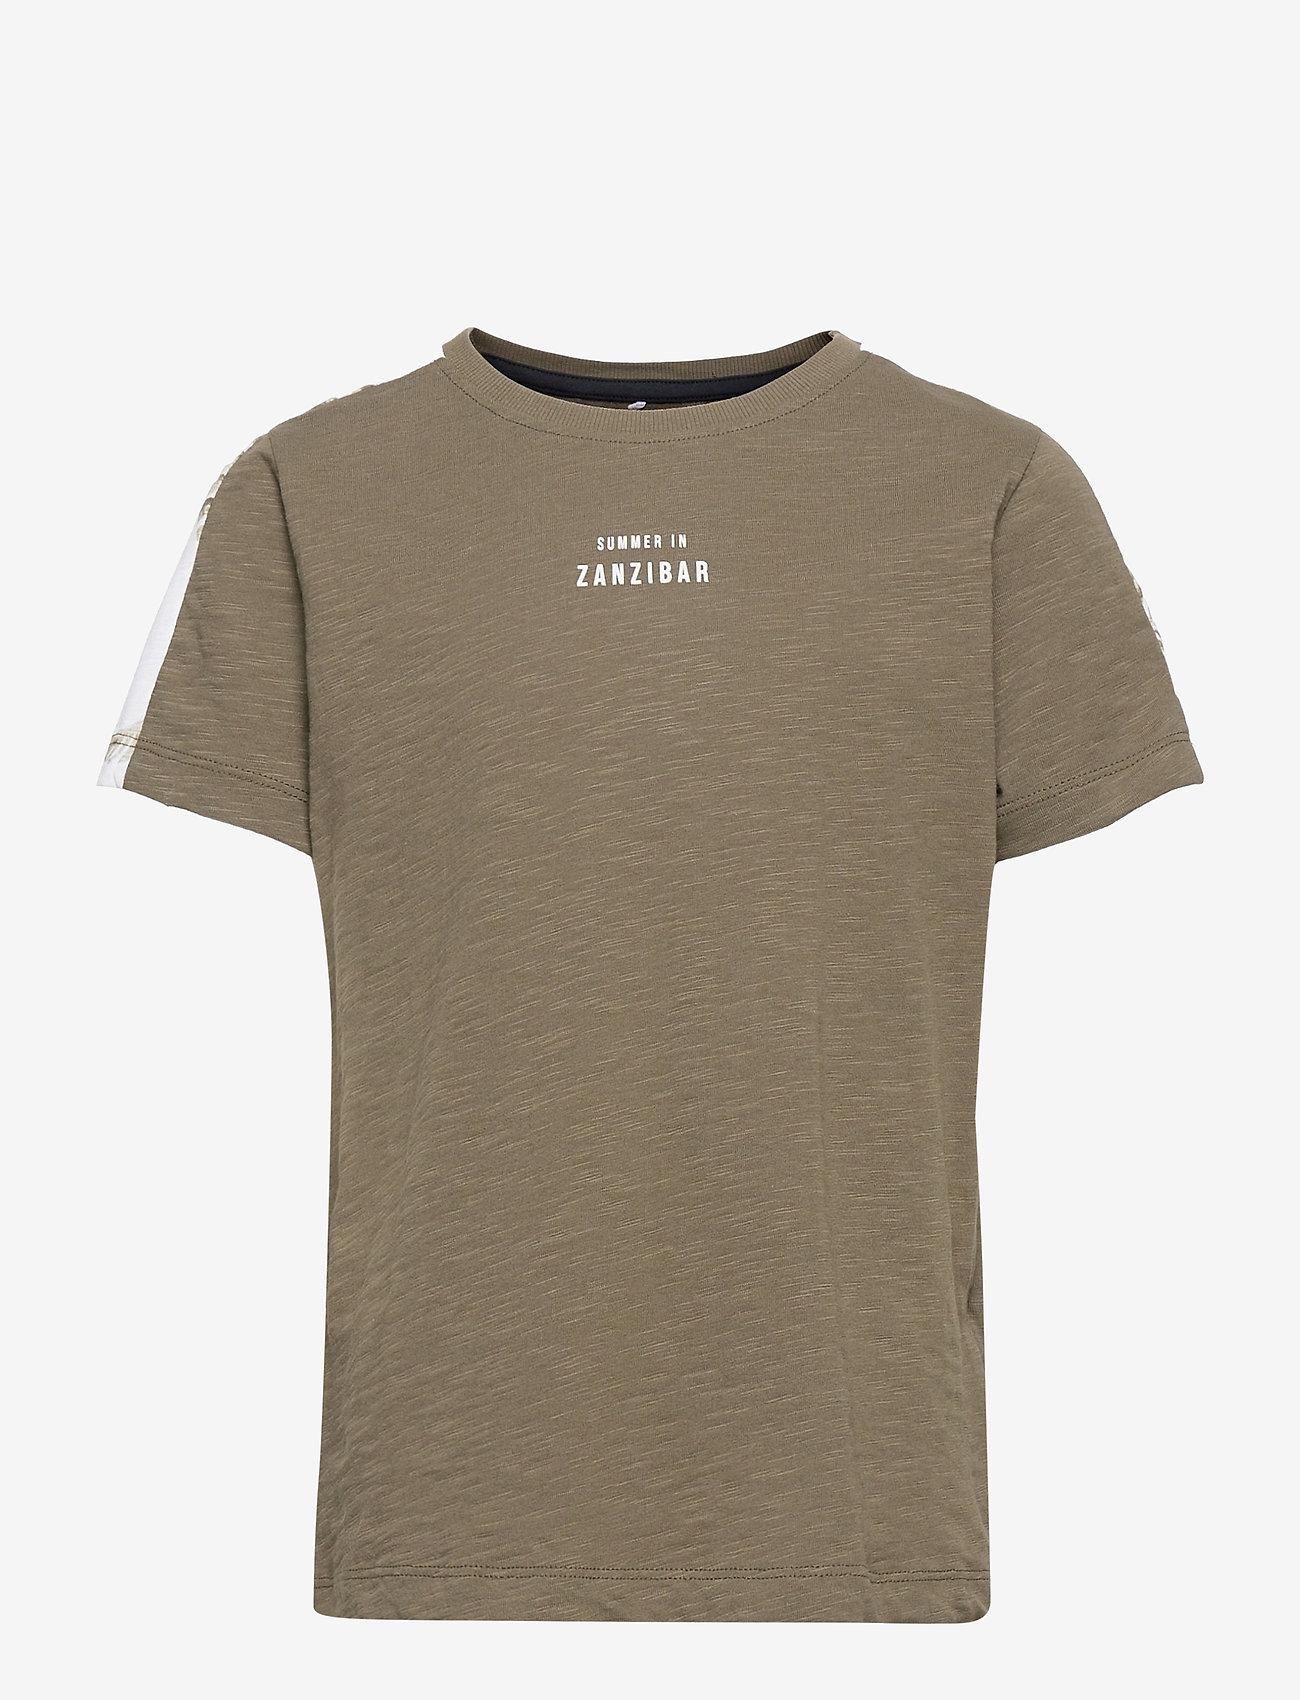 name it - NKMHAILOM SS TOP - t-shirts - ivy green - 0